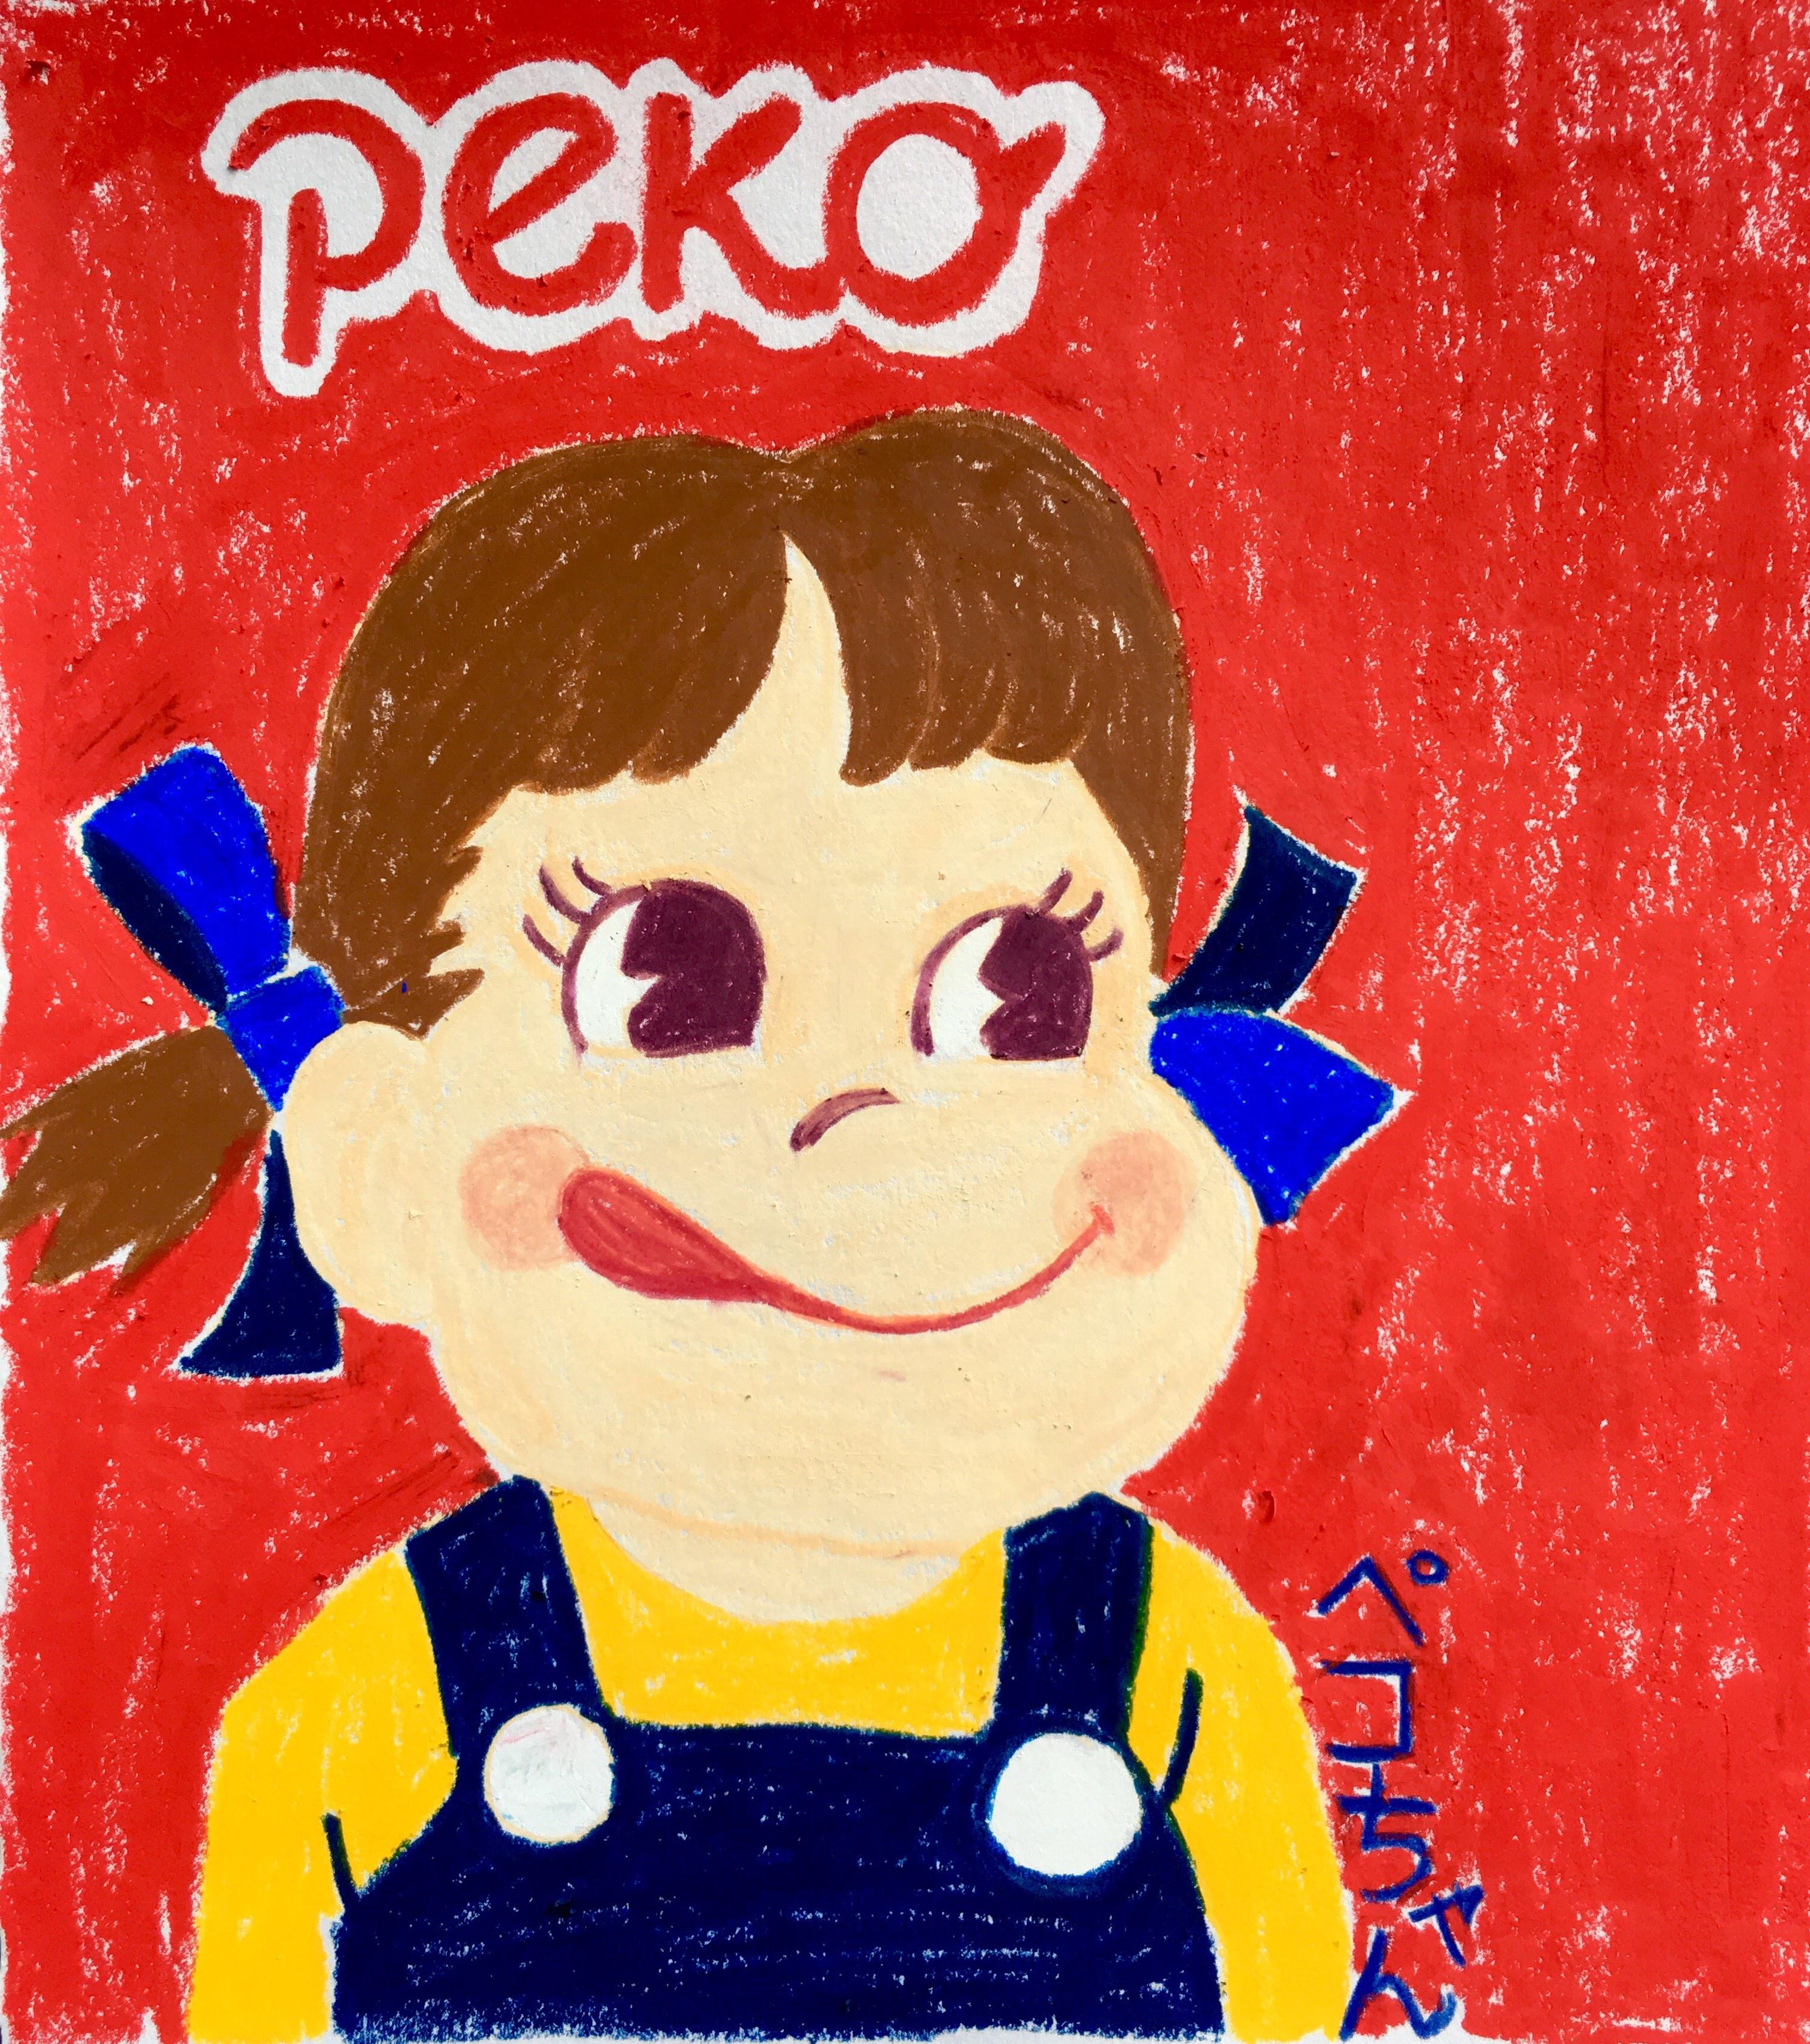 Pekochan, the Fujiya mascot